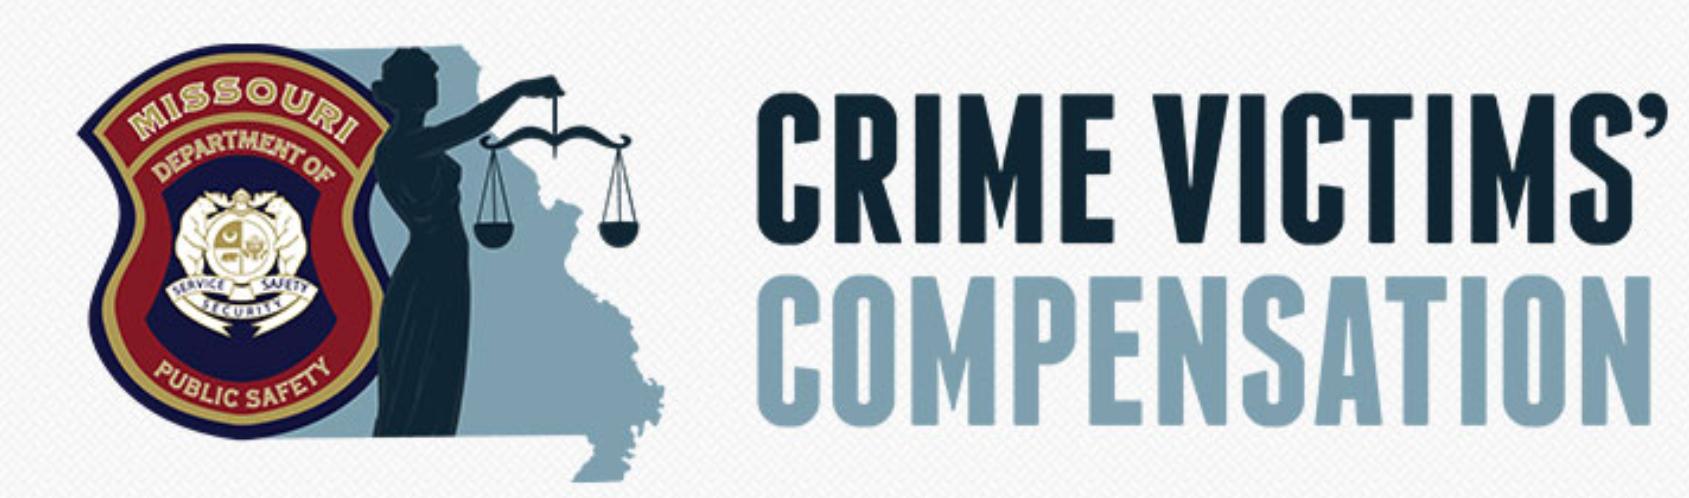 MO Crime Victim compensation.png